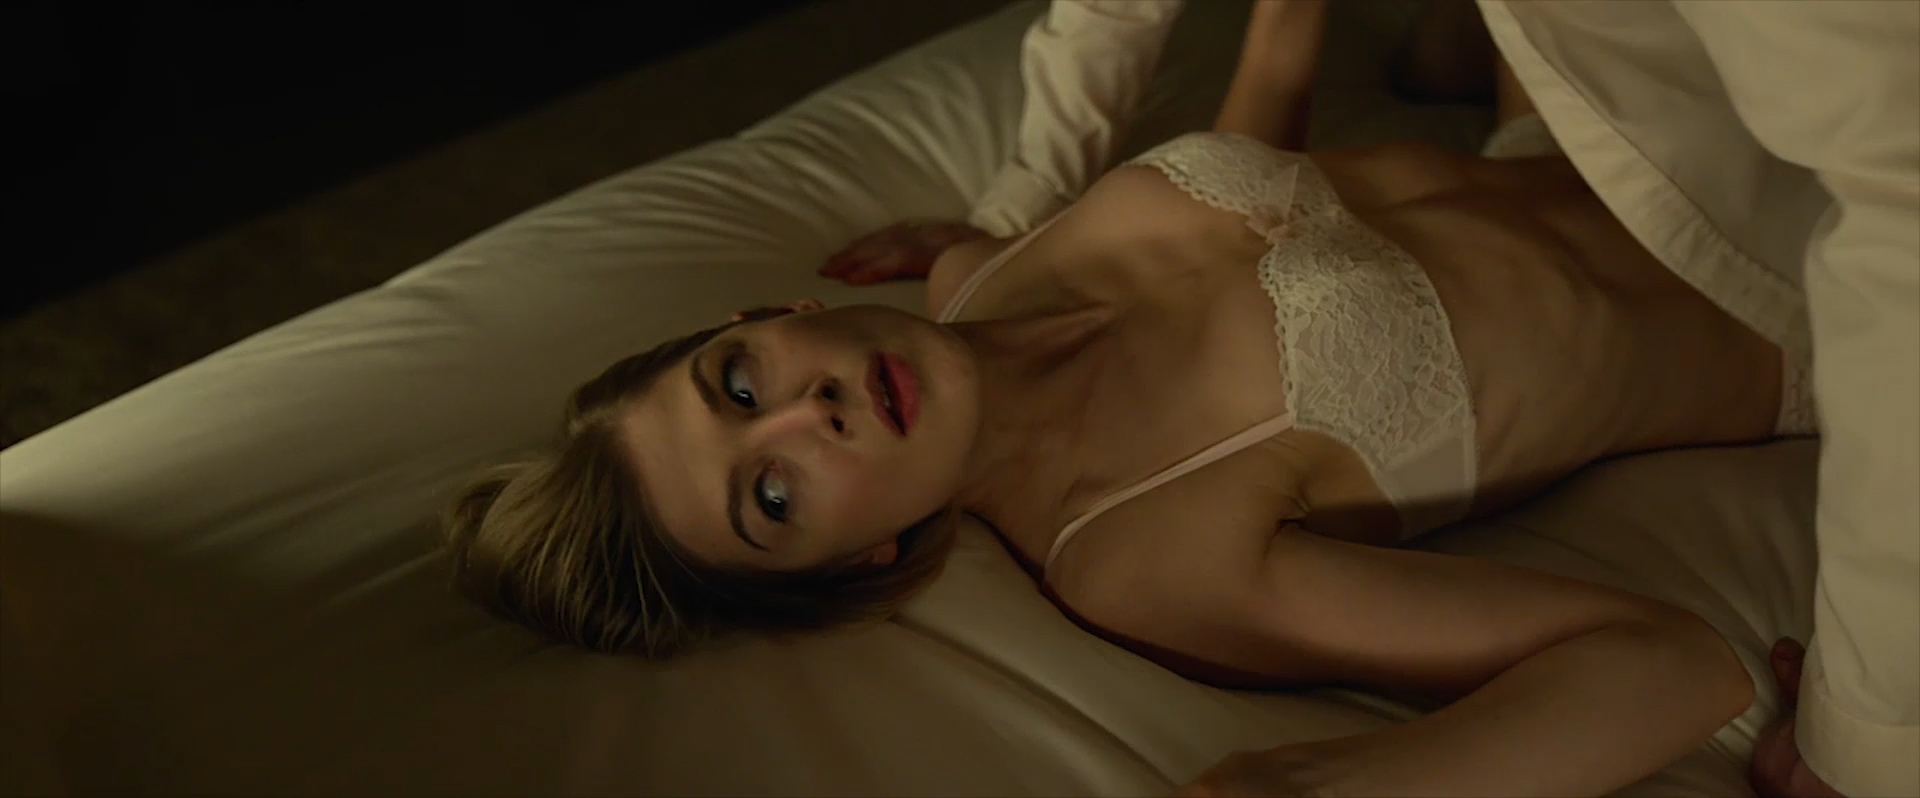 reife verheiratete paare sex webcams